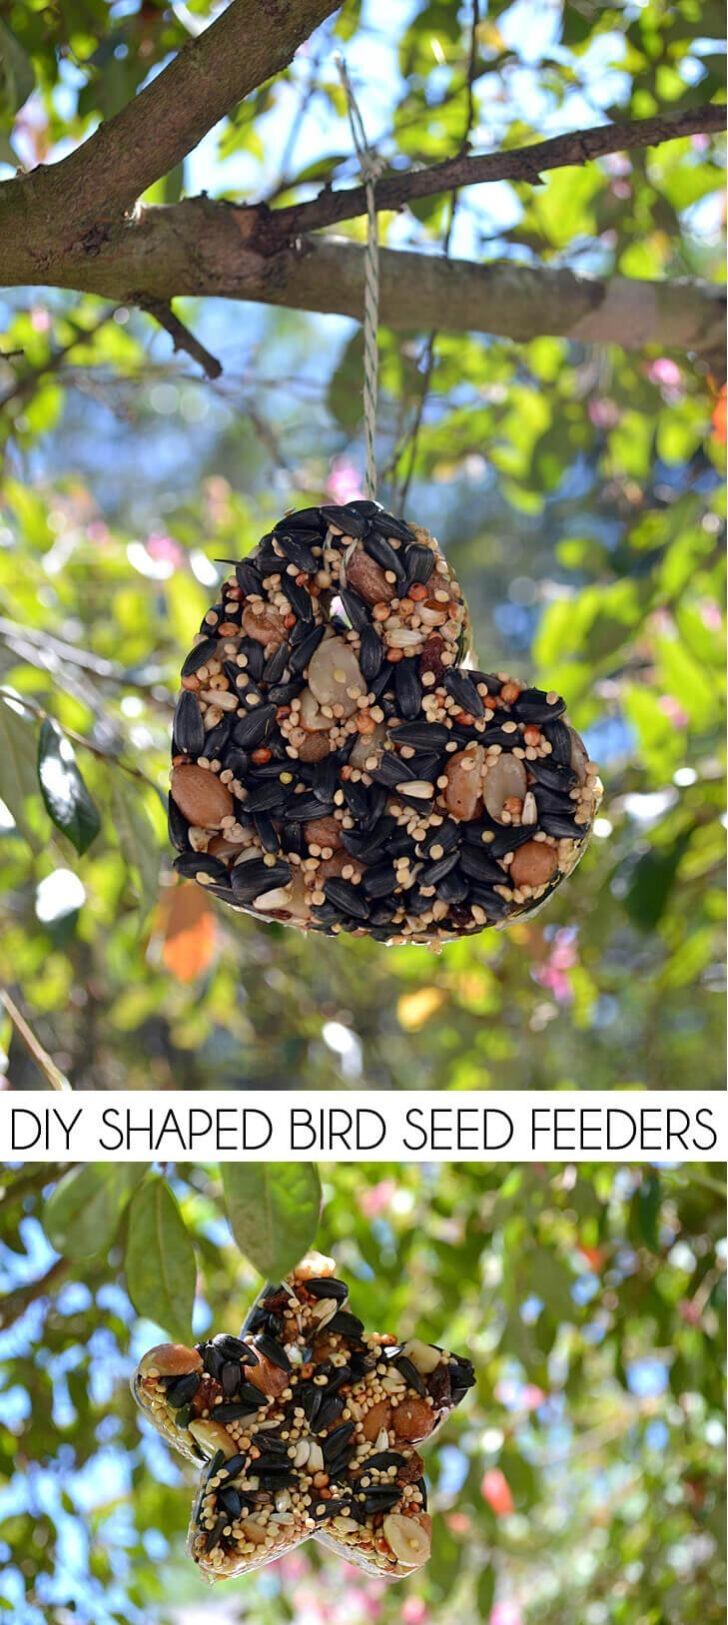 DIY Shaped Birdseed Feeders